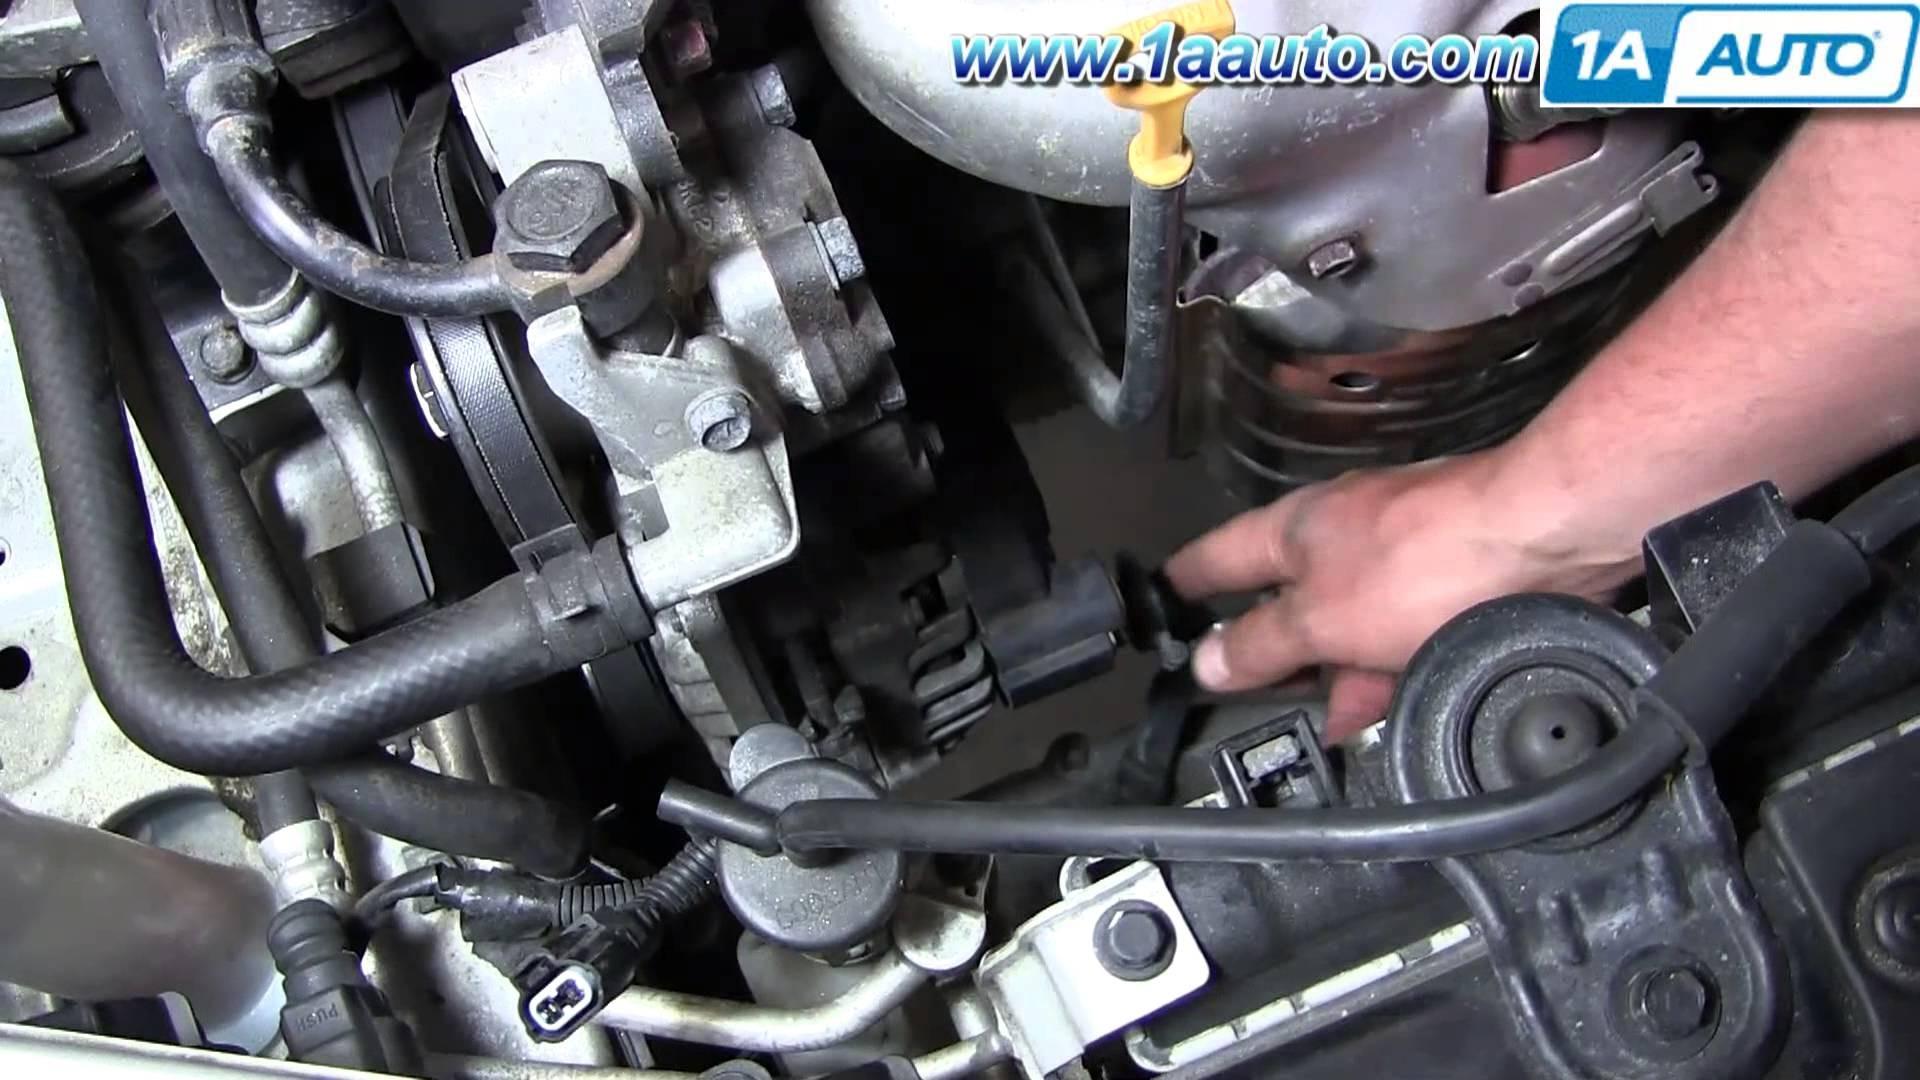 2002 hyundai elantra engine diagram car starter wiring how to install replace